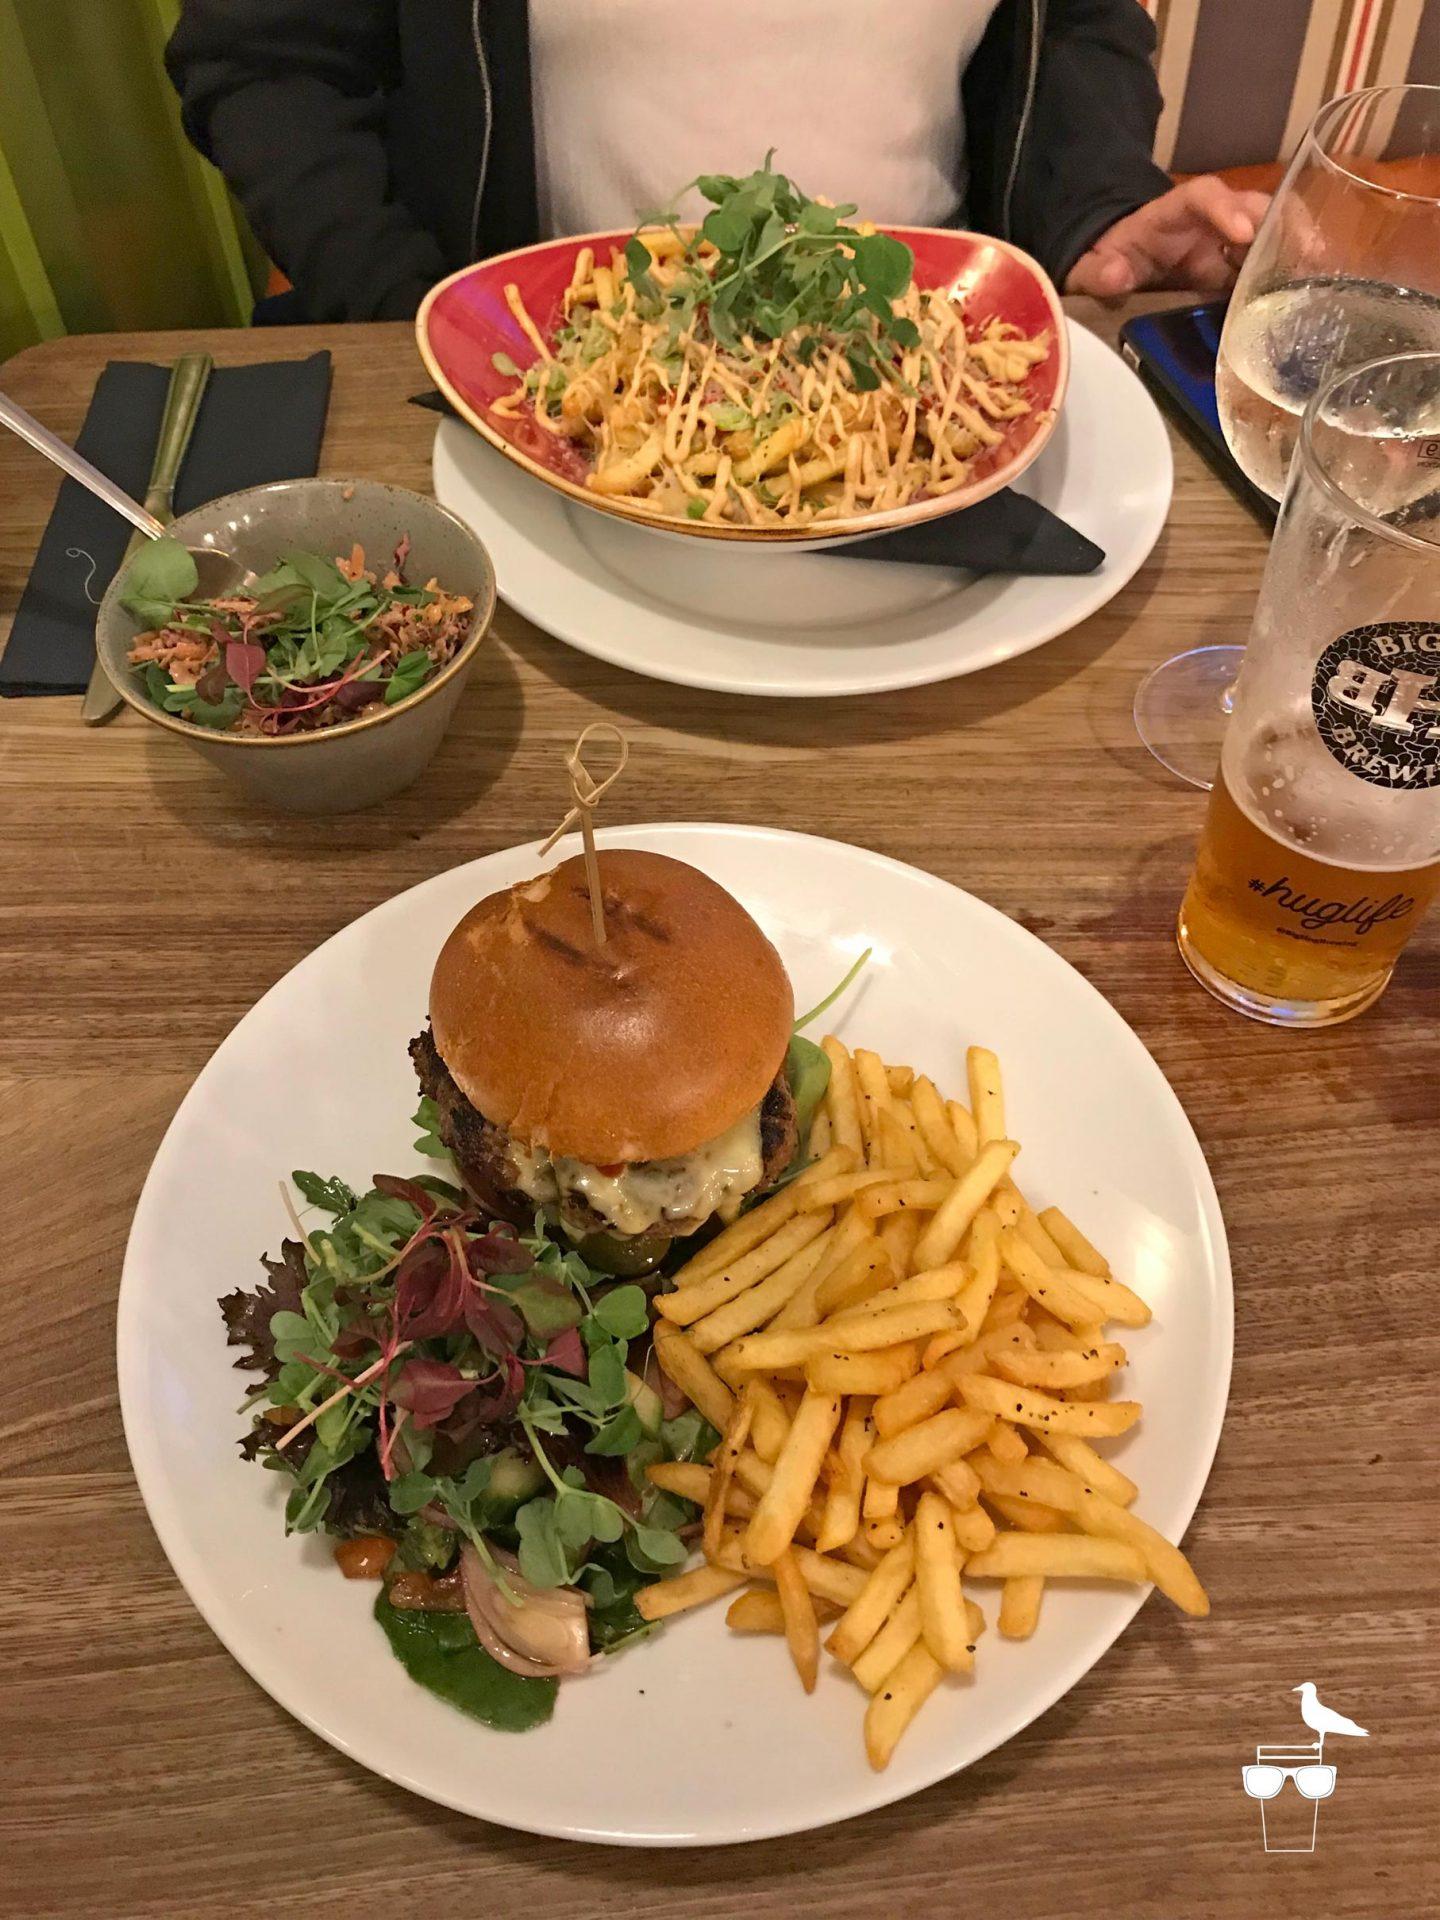 the-prestonville-arms-pub-brighton-food-burger-loaded-fries